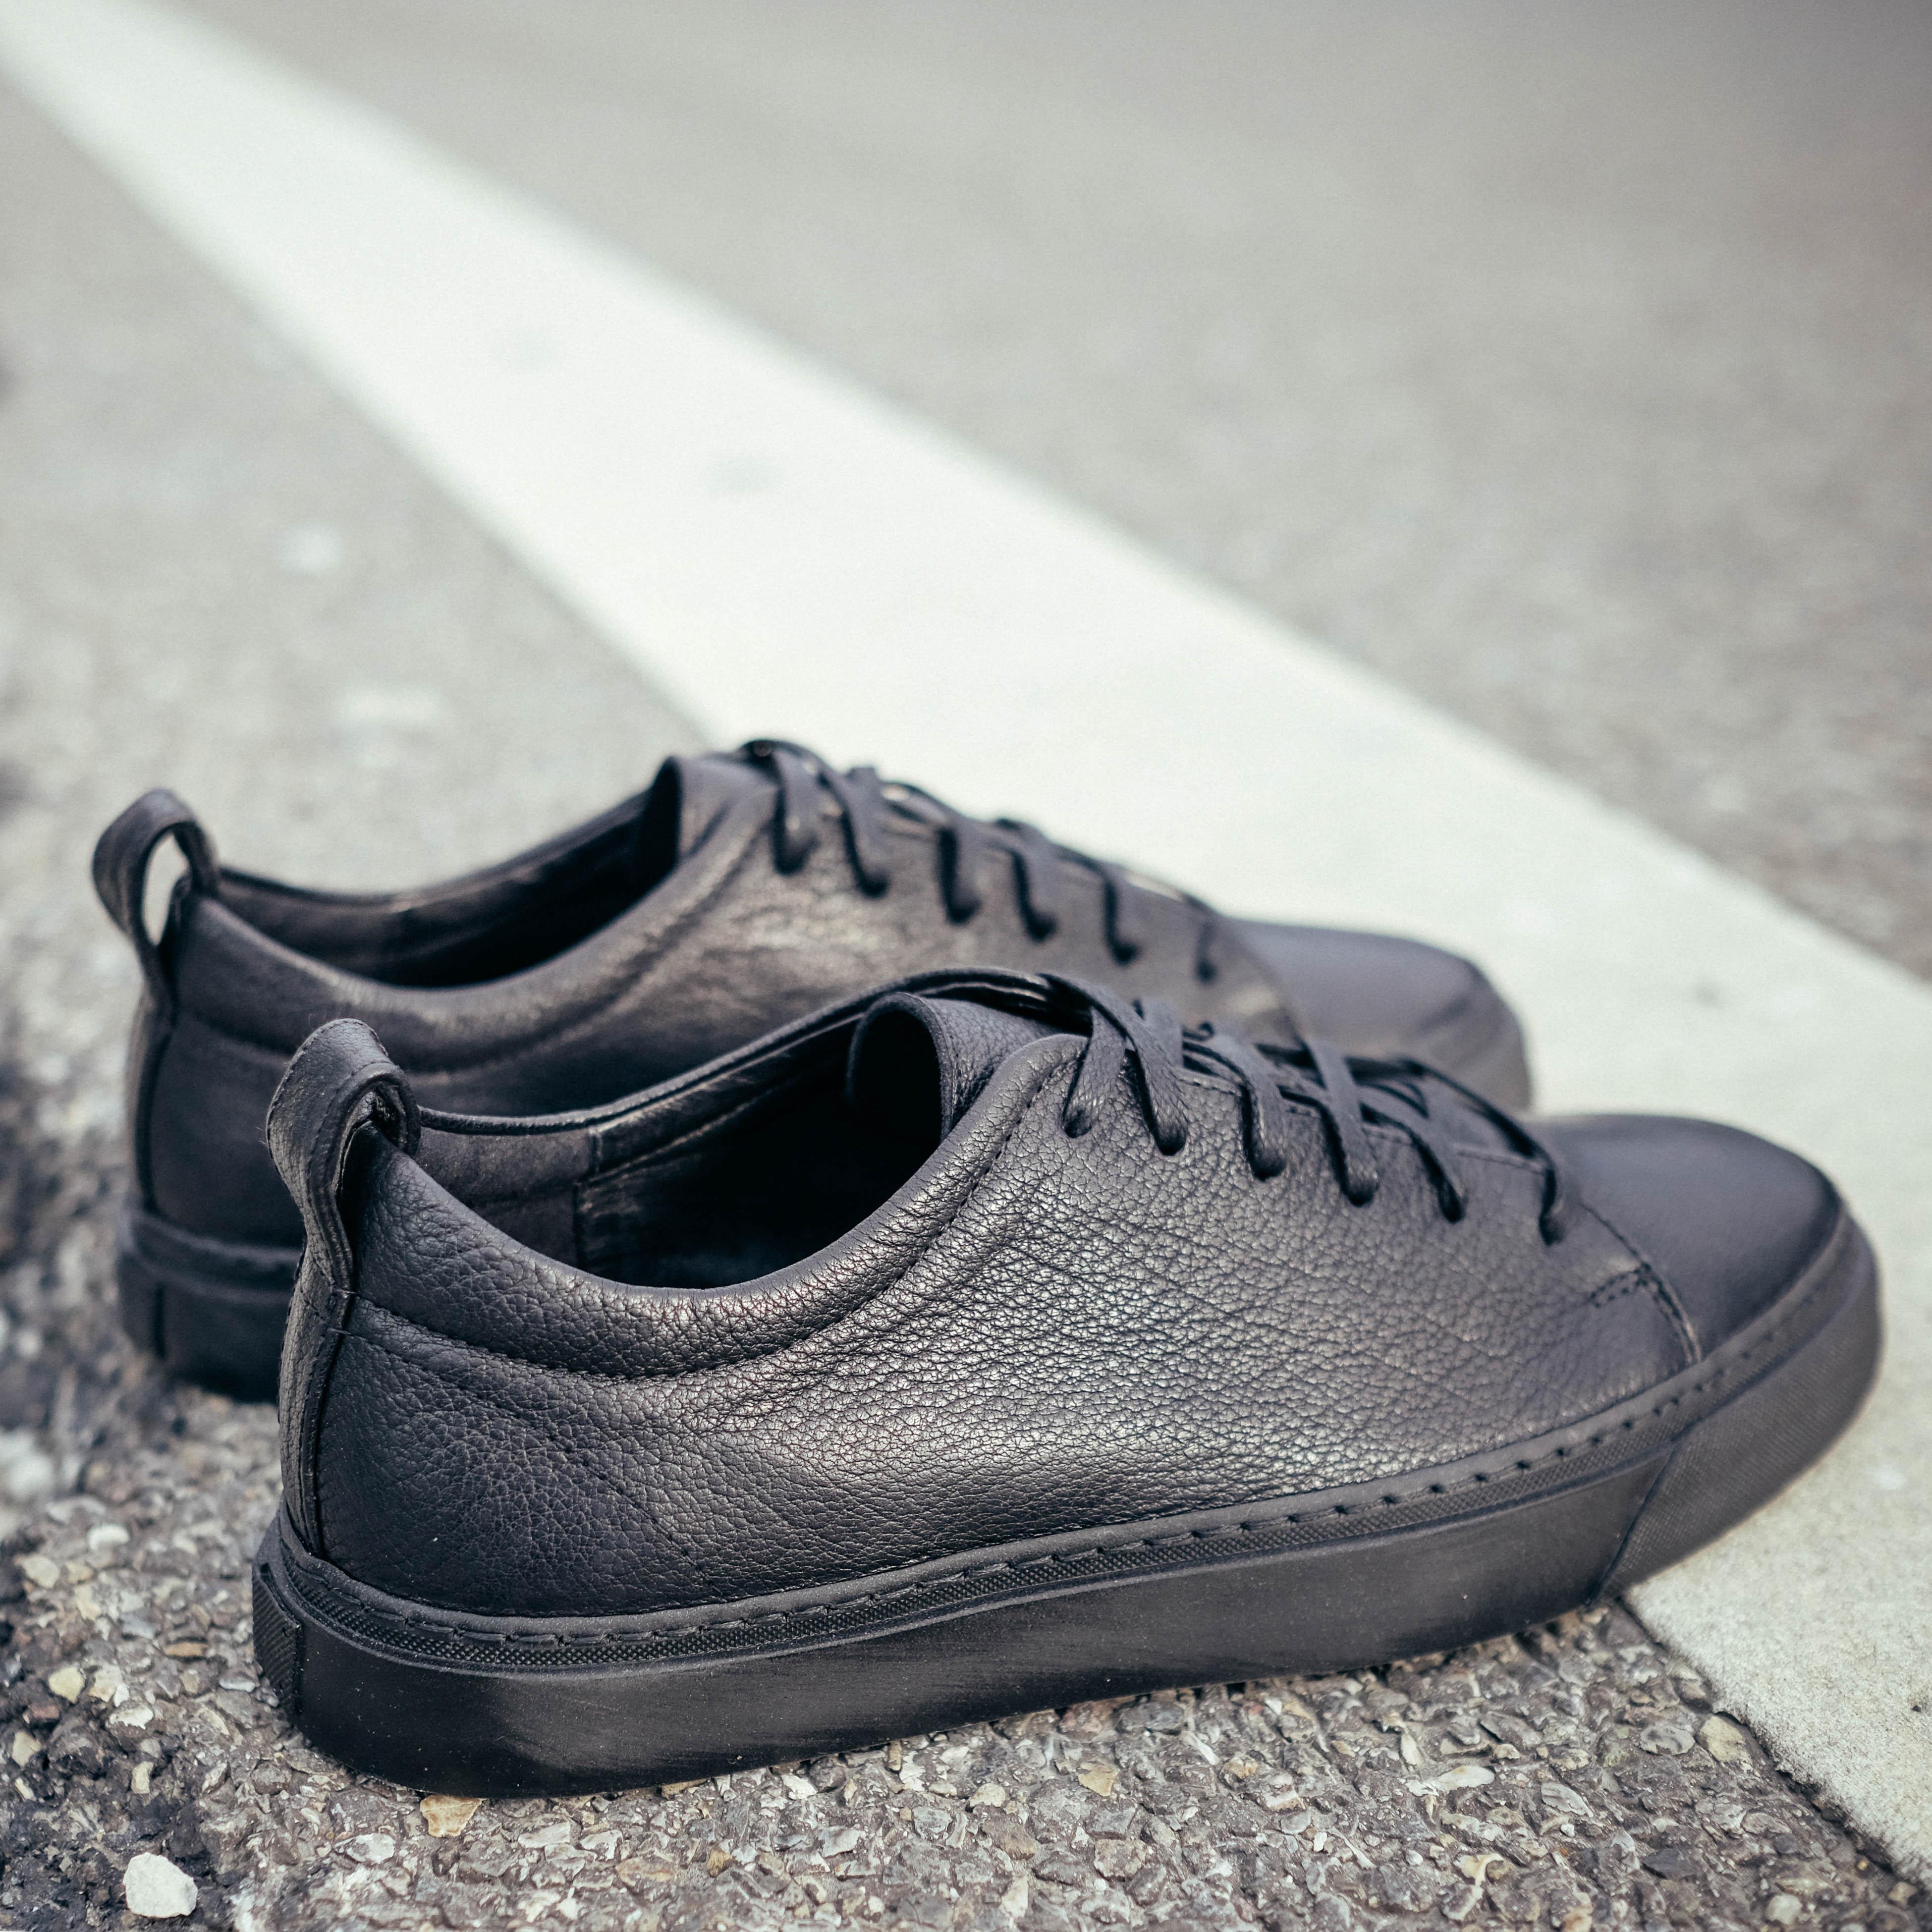 soeder_sneaker 1x1